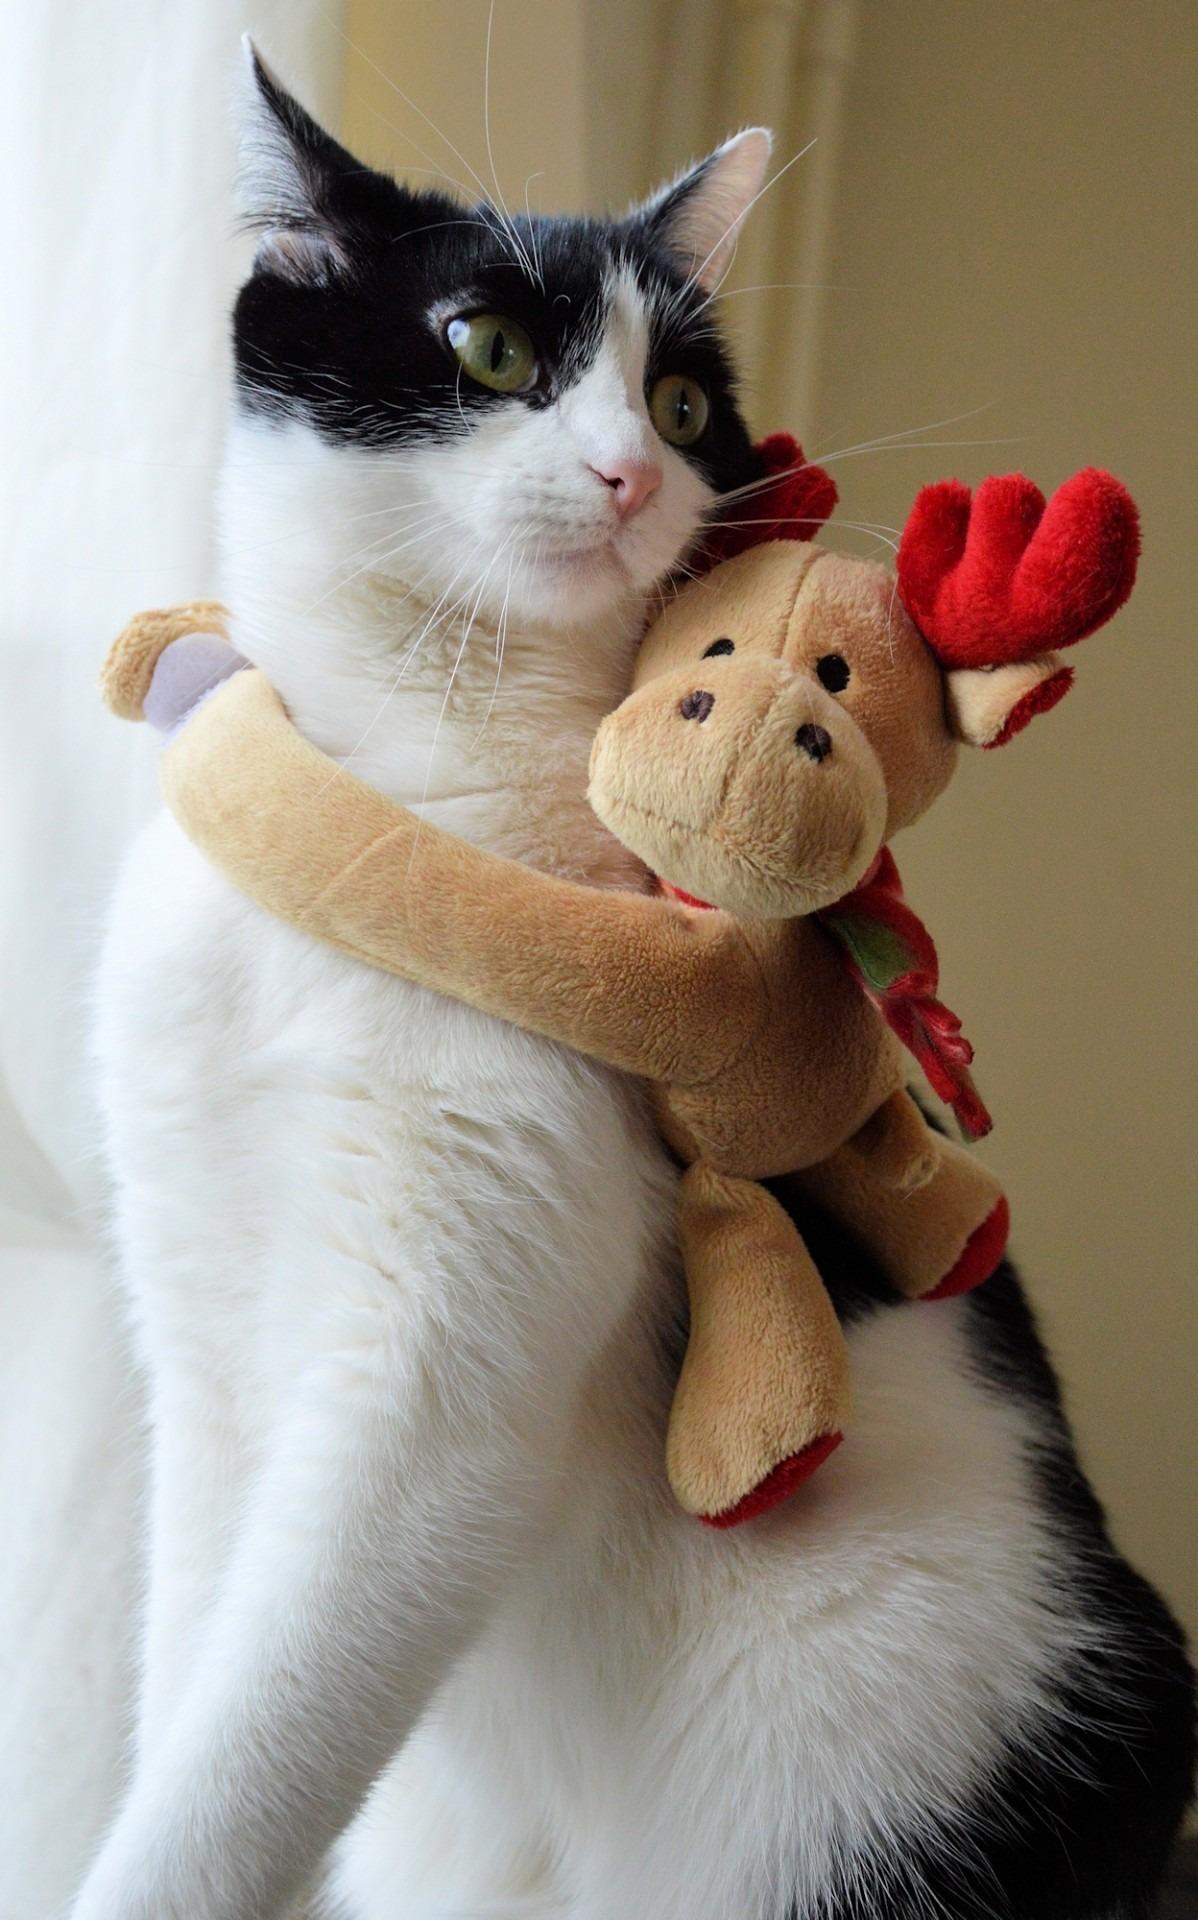 Gambar : putih, rusa, membelai, anak kucing, binatang menyusui, hari Natal, hidung, cambang, kulit, bertulang belakang, boneka, kecil untuk kucing berukuran ...